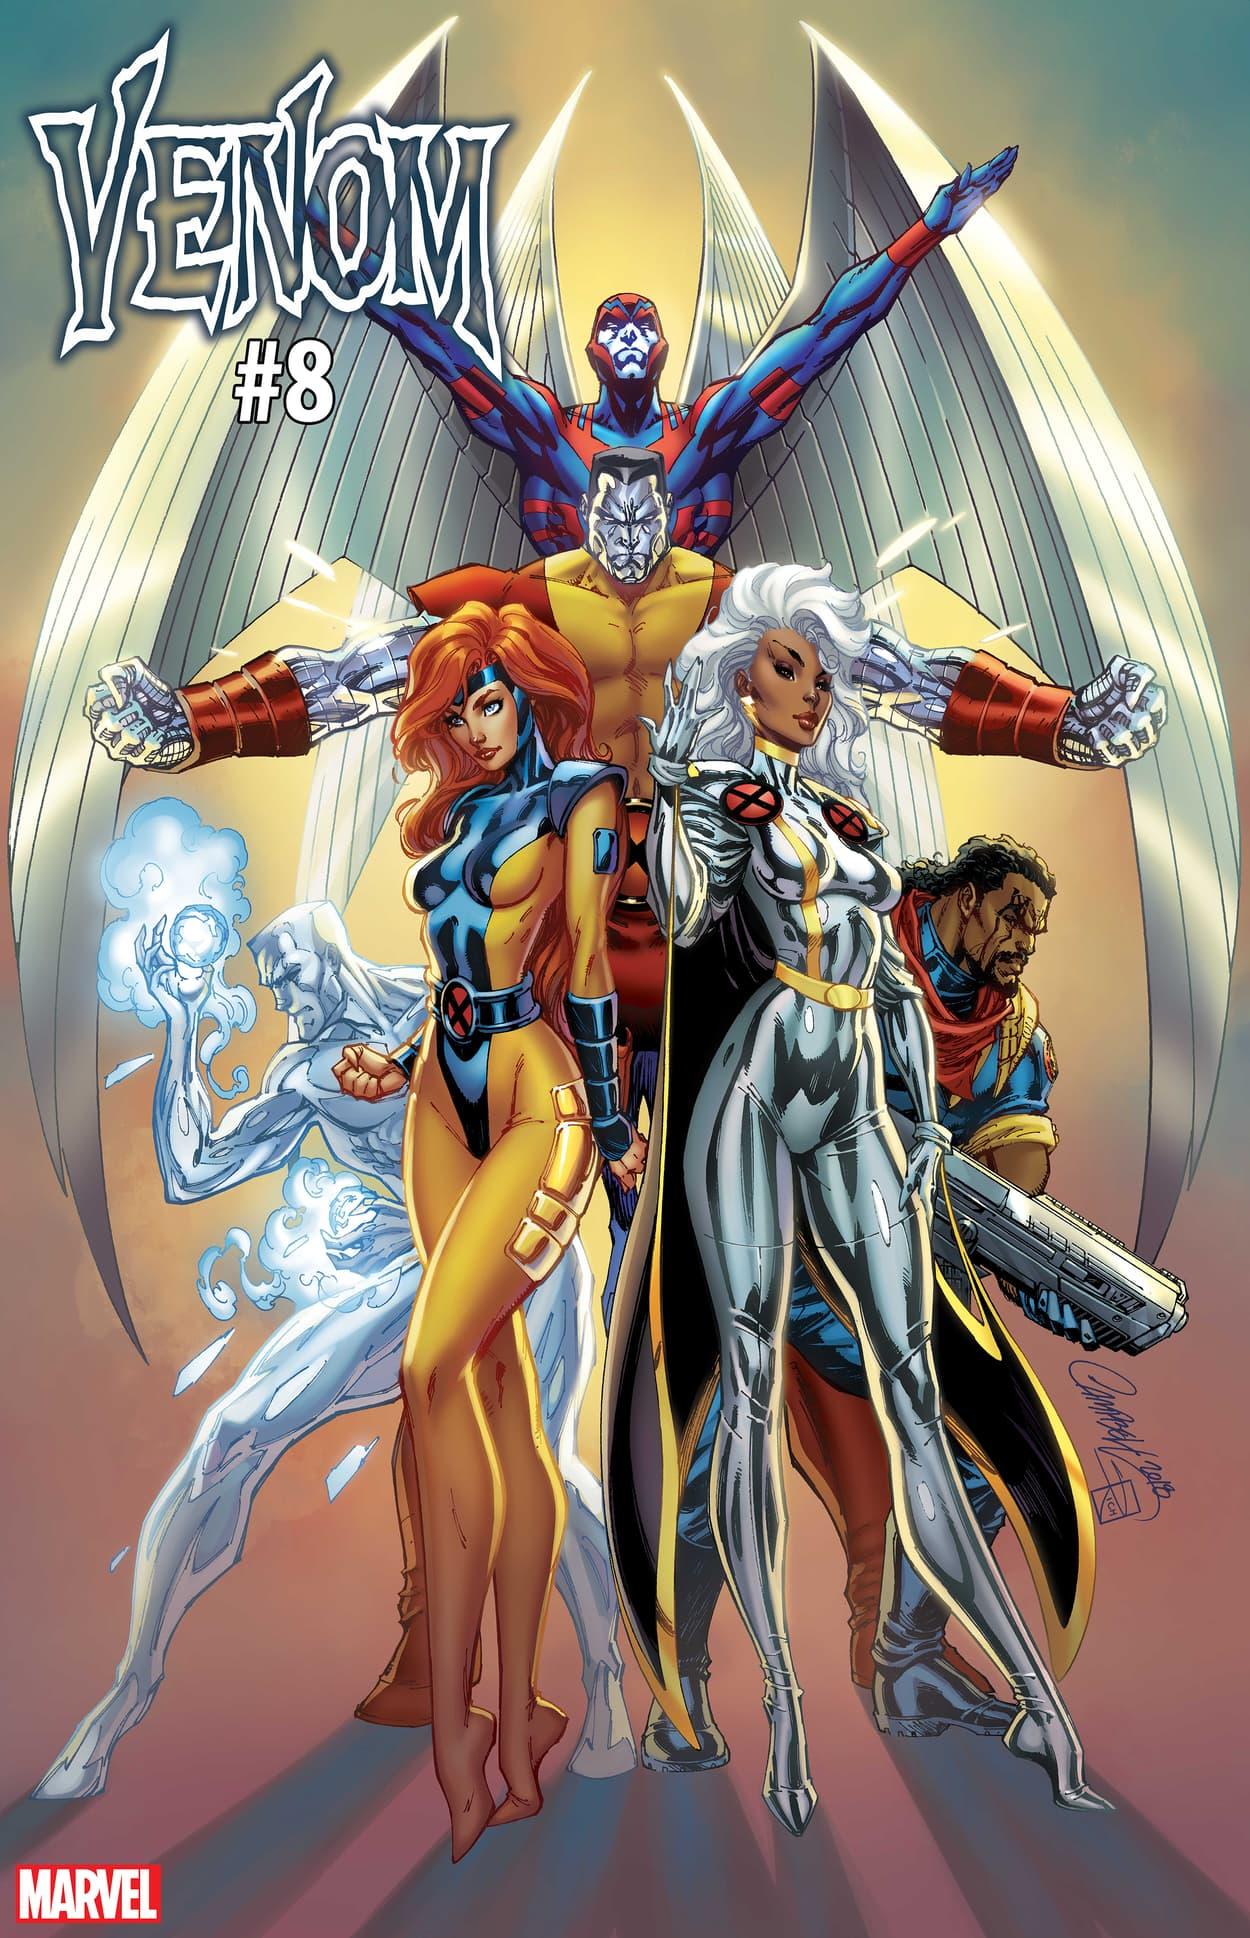 VENOM #8 / UNCANNY X-MEN VARIANT COVER by J. Scott Campbell